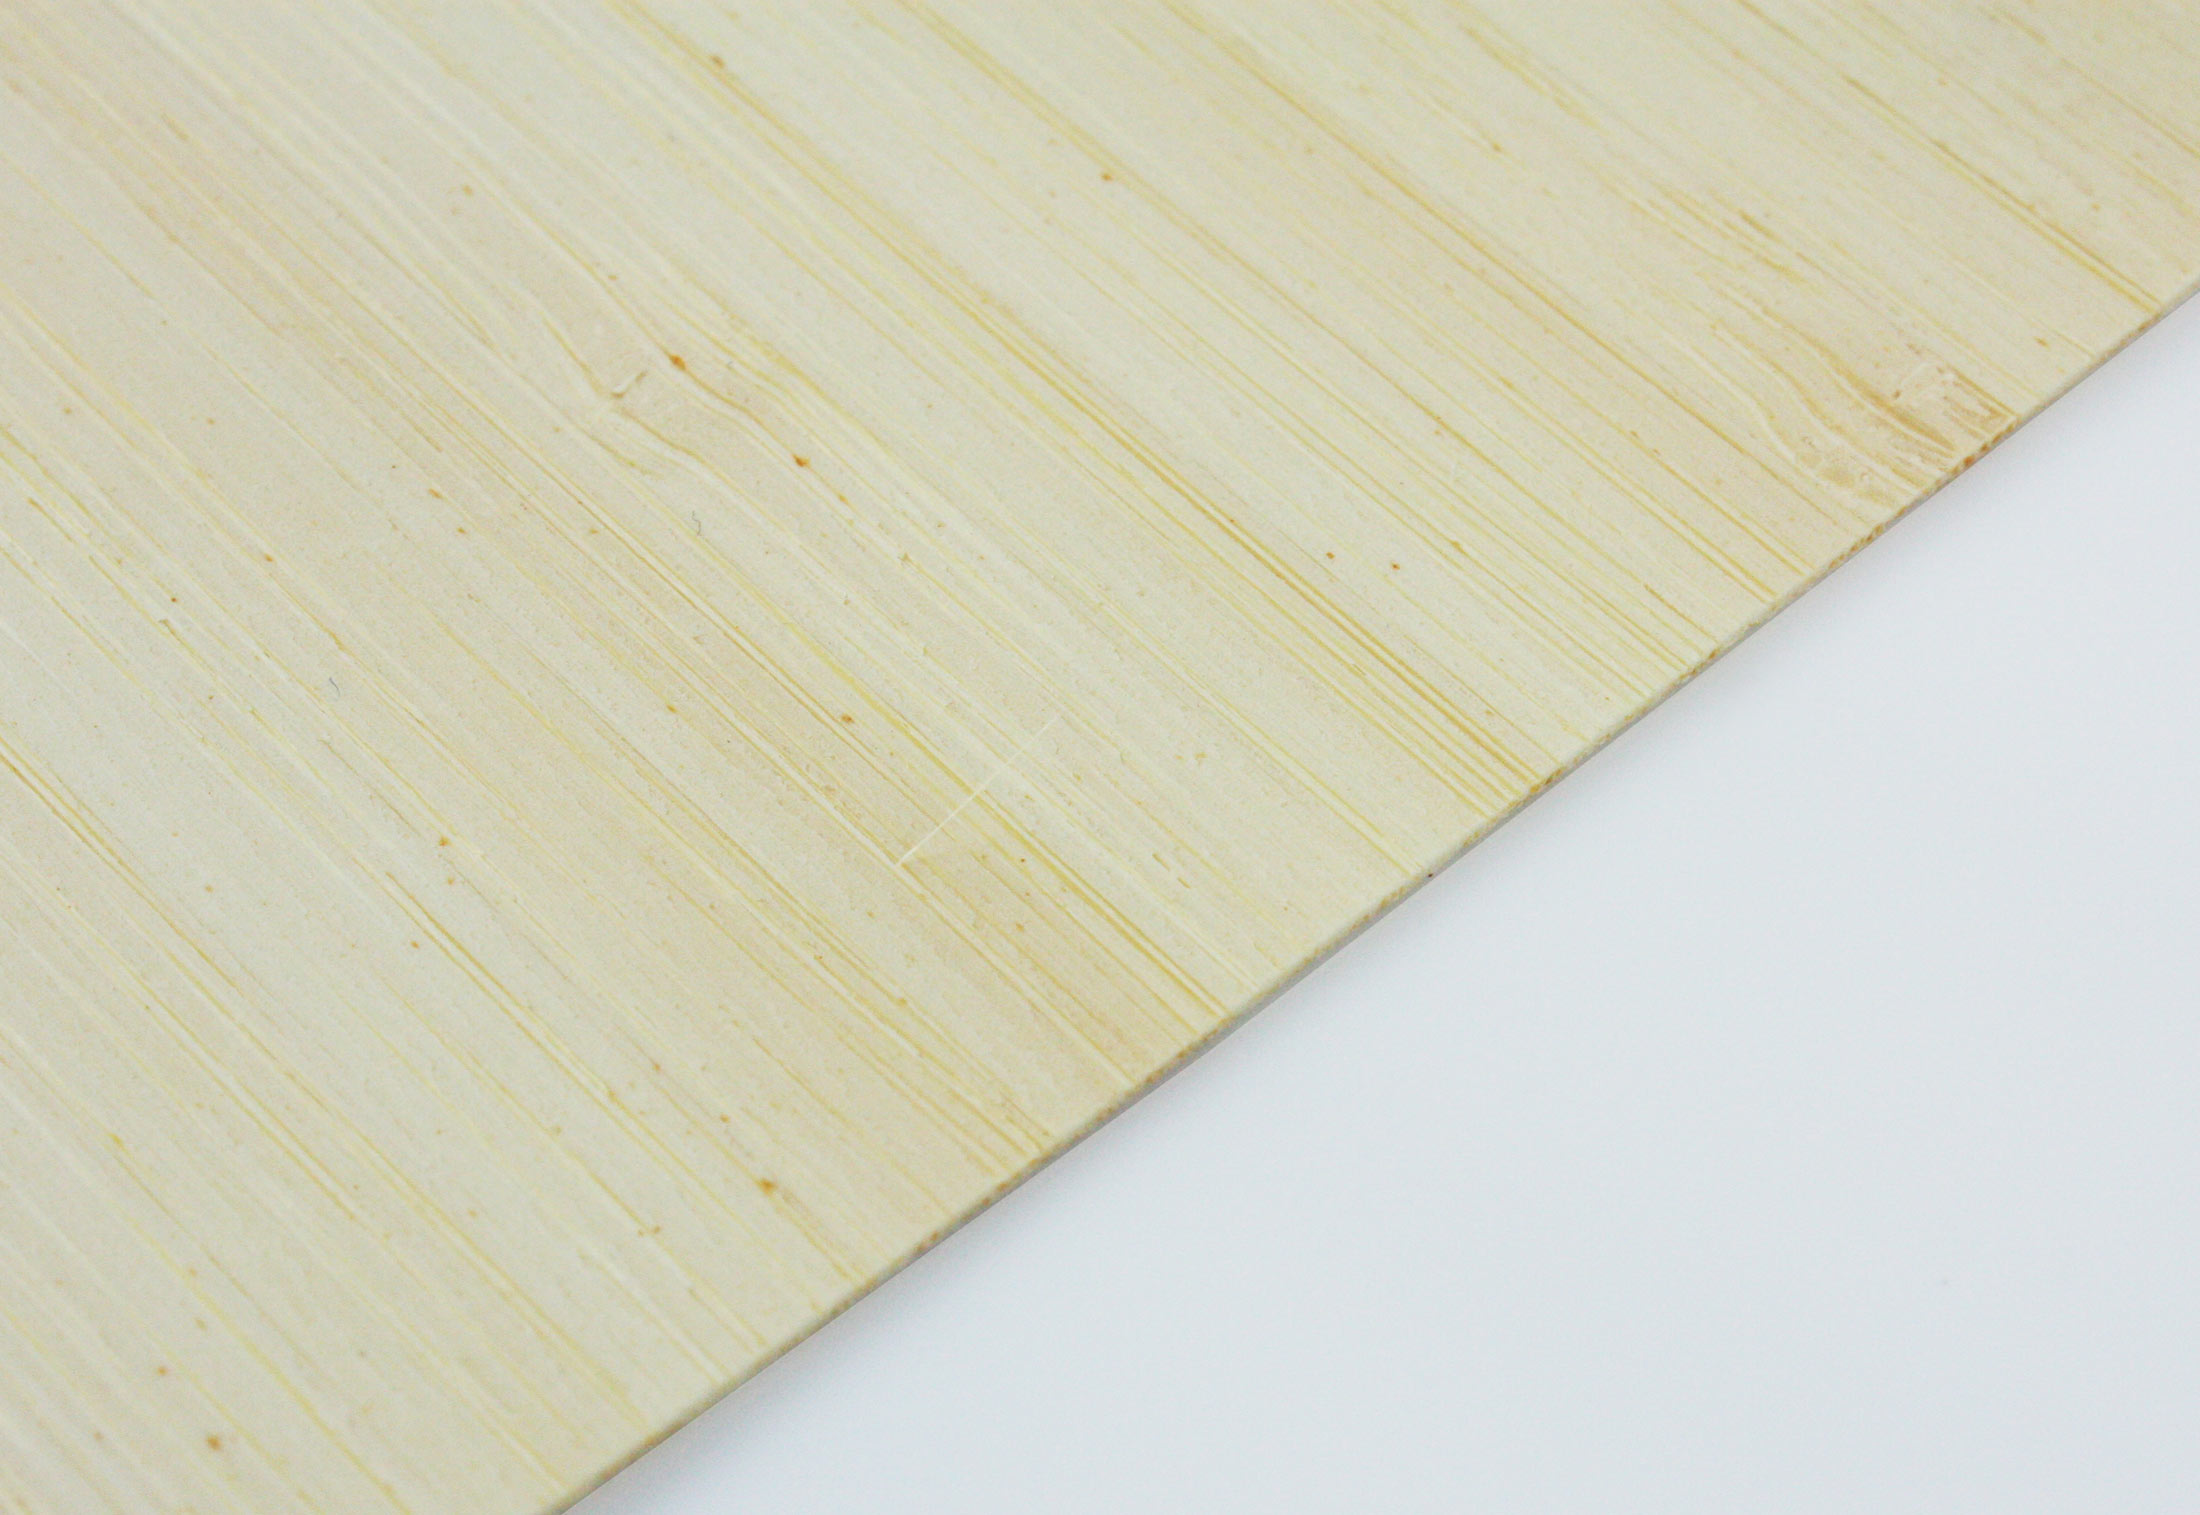 MOSO bamboo veneer by MOSO